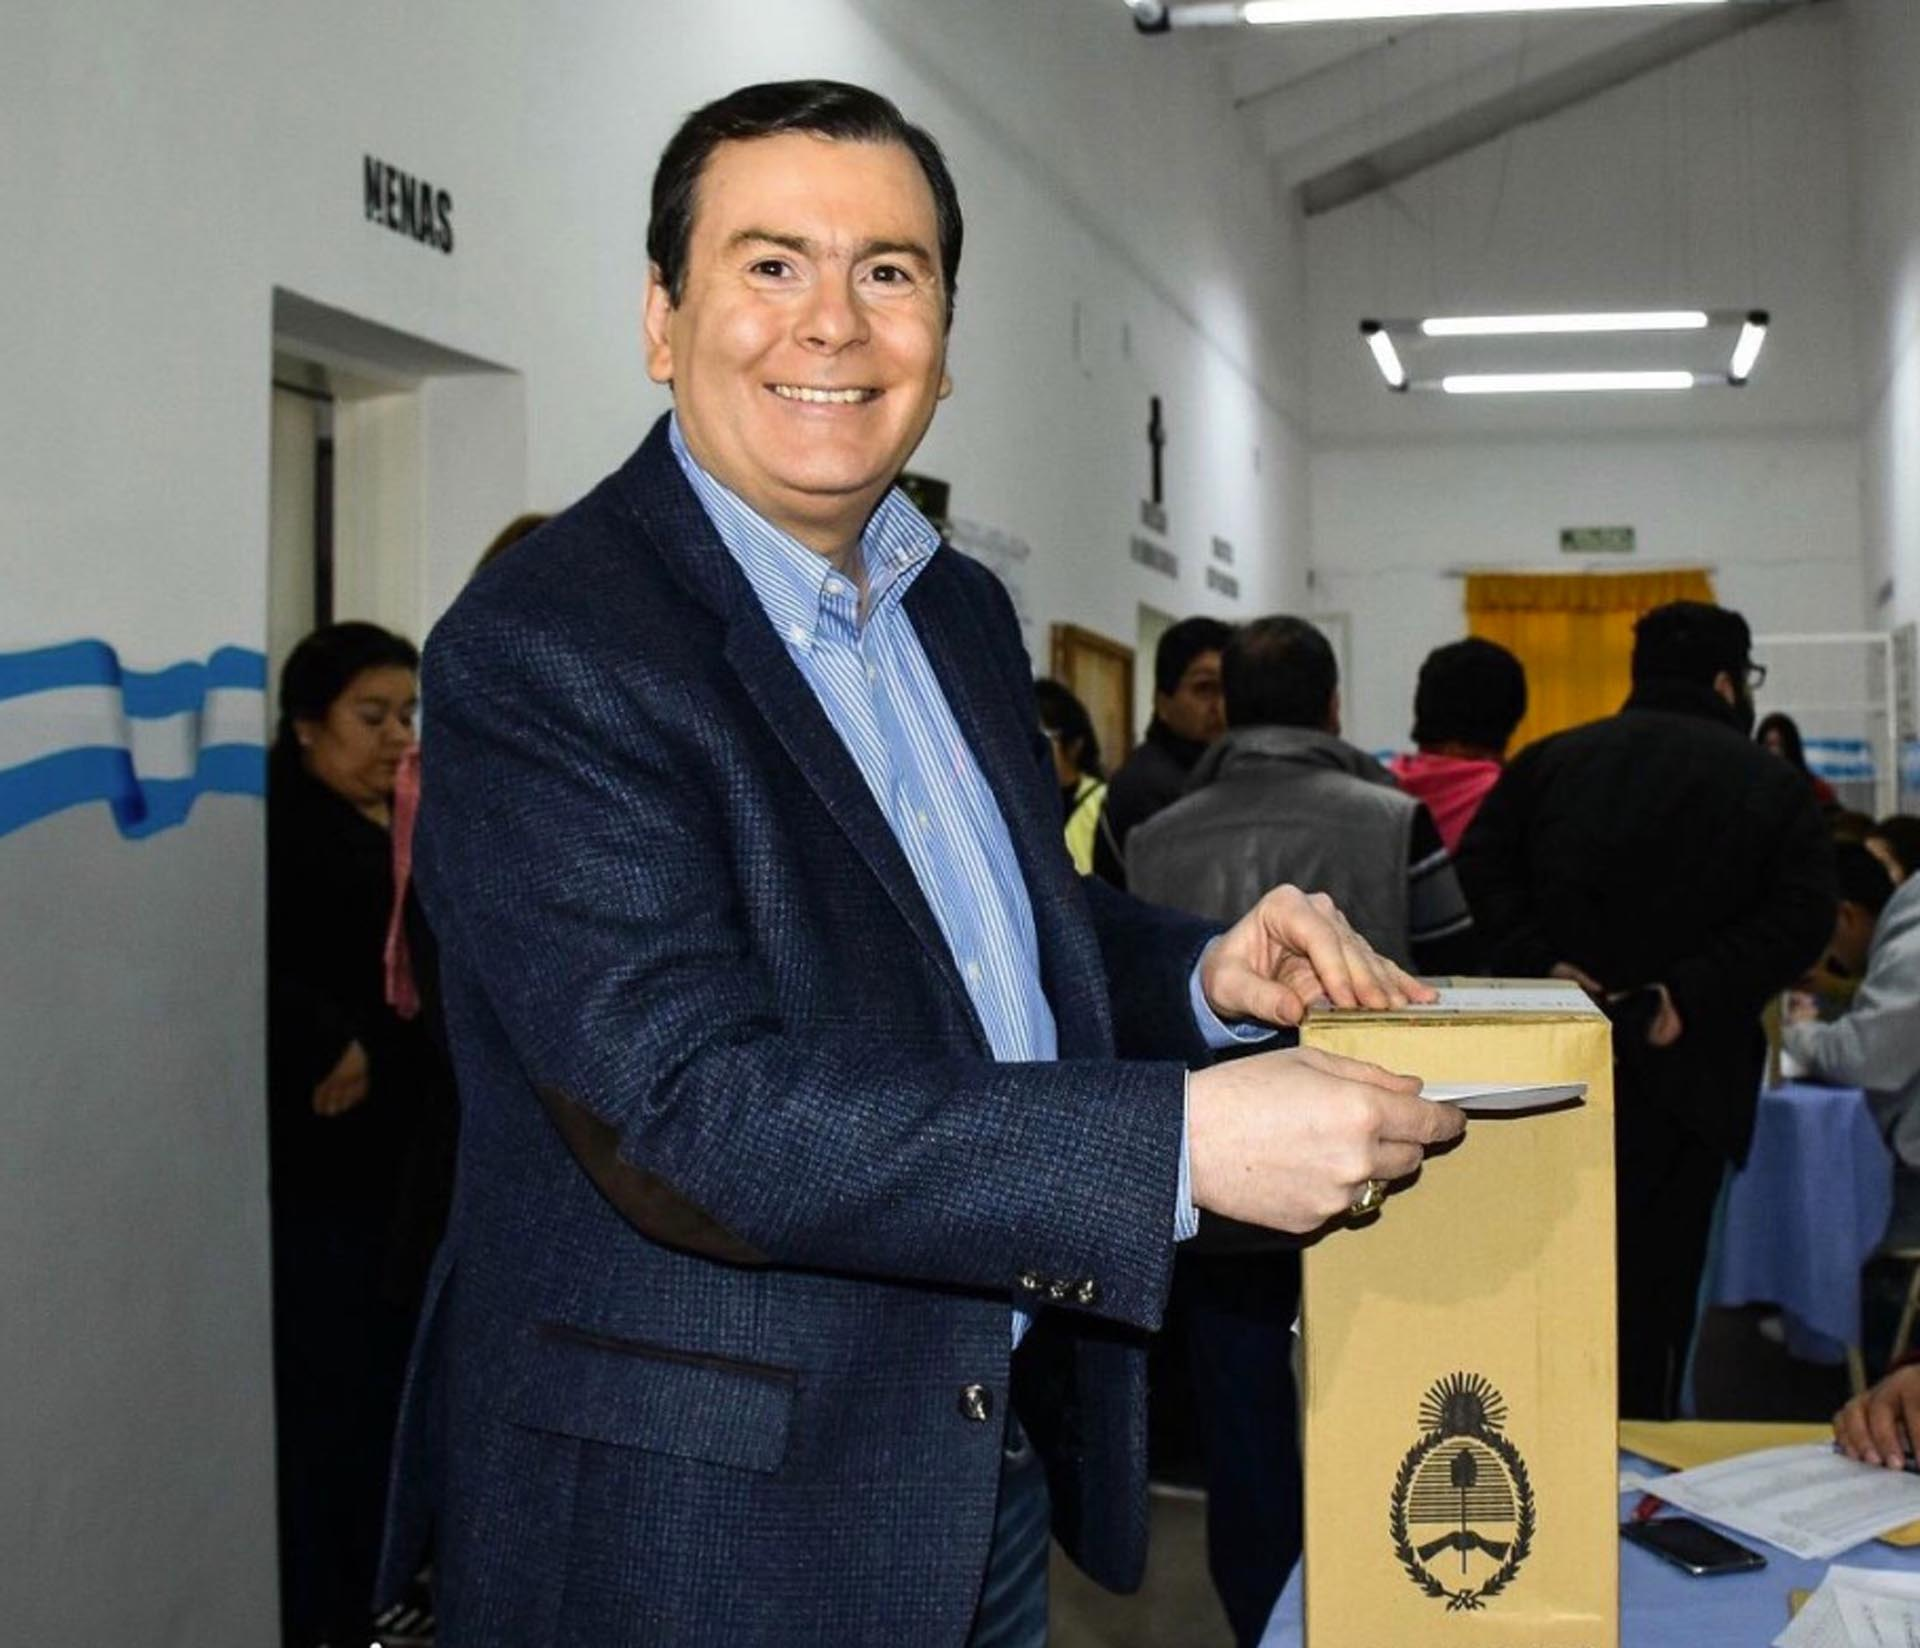 Gobernador Gerardo Zamora emitiendo su voto